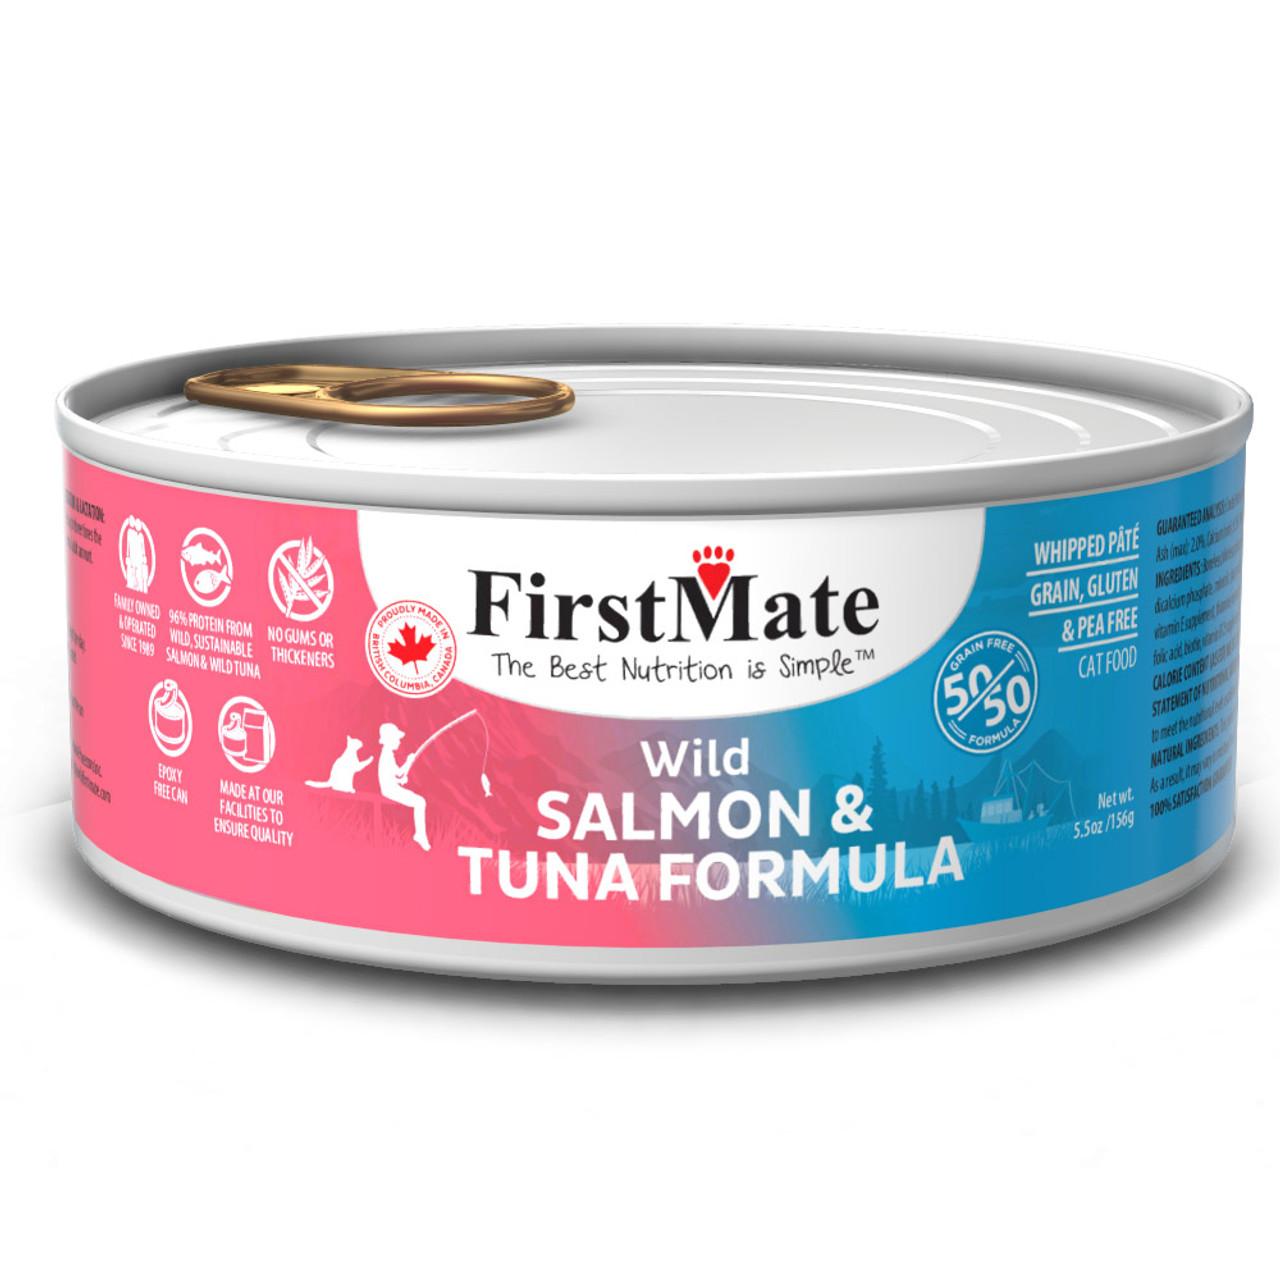 FirstMate 50/50 Wild Salmon & Wild Tuna Formula Canned Cat Food